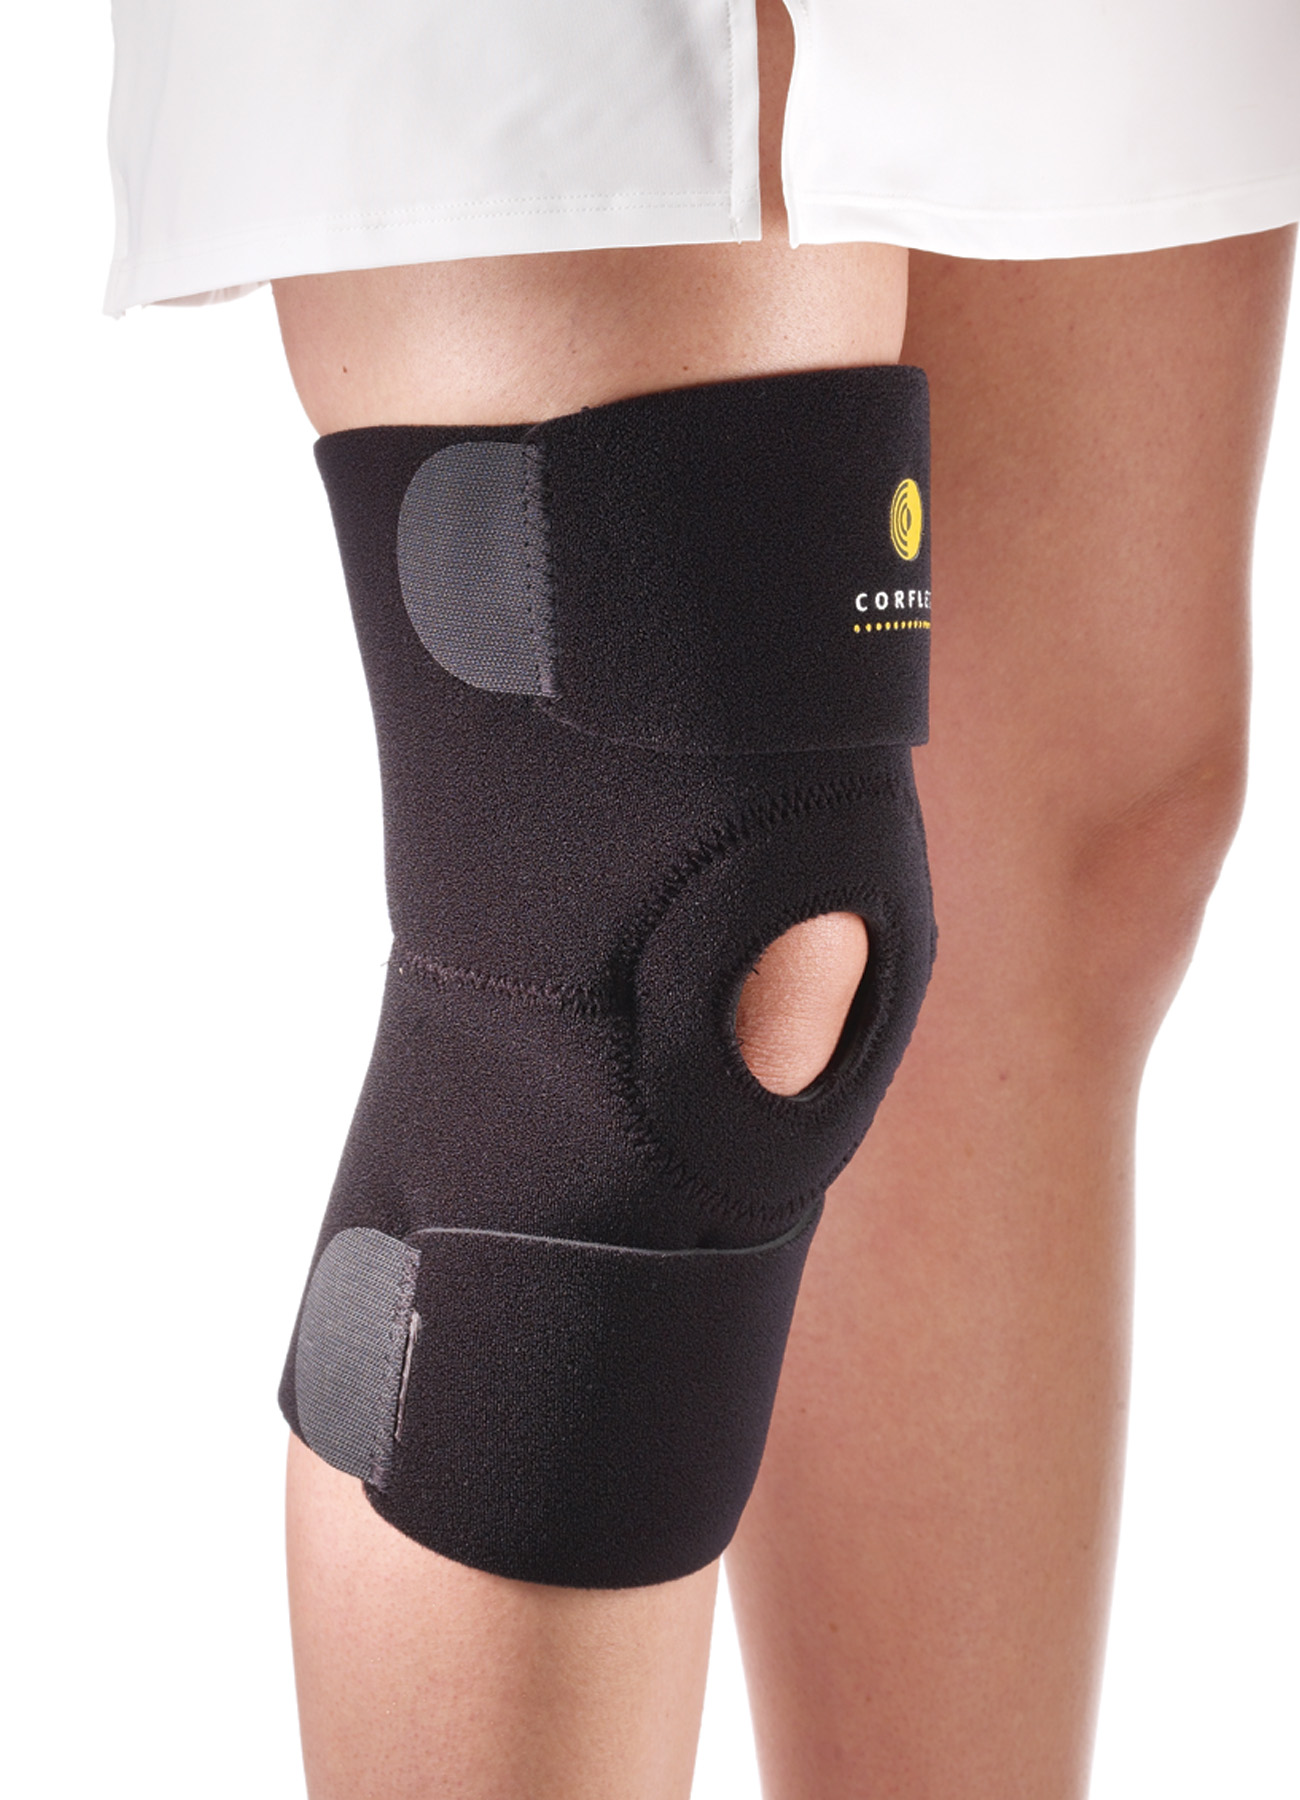 how to put on knee wraps